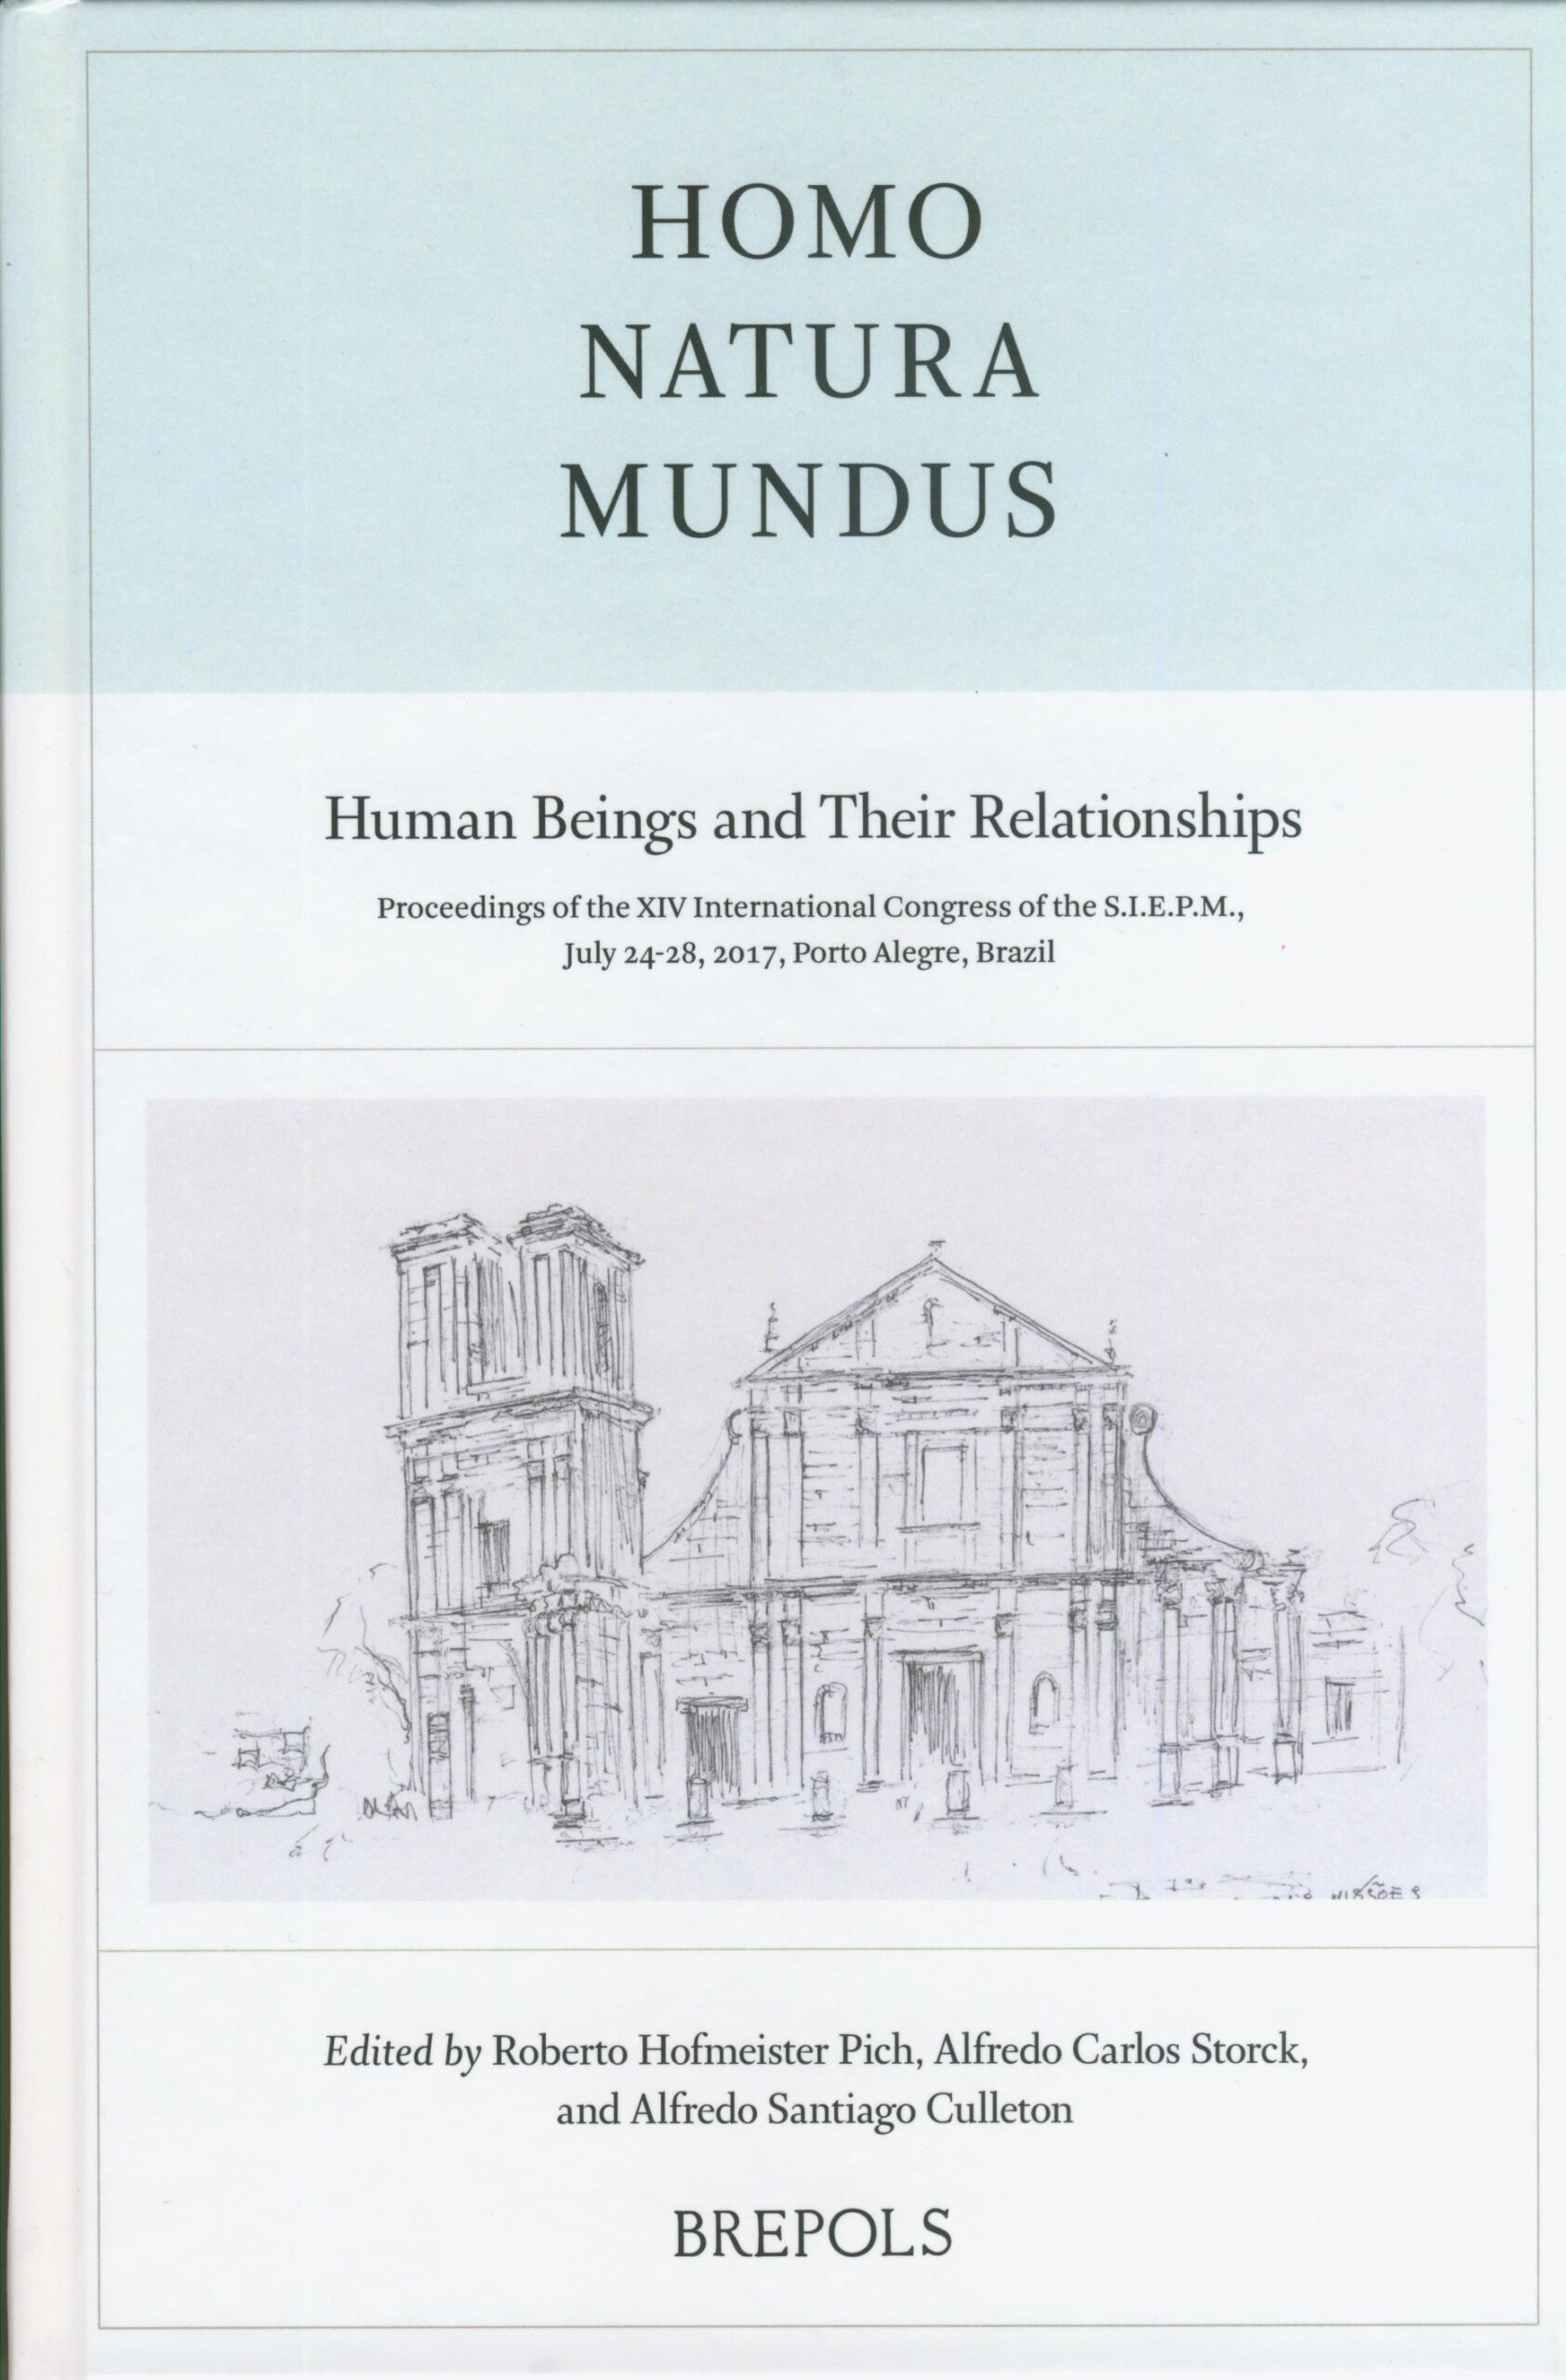 Homo, Natura, Mundus